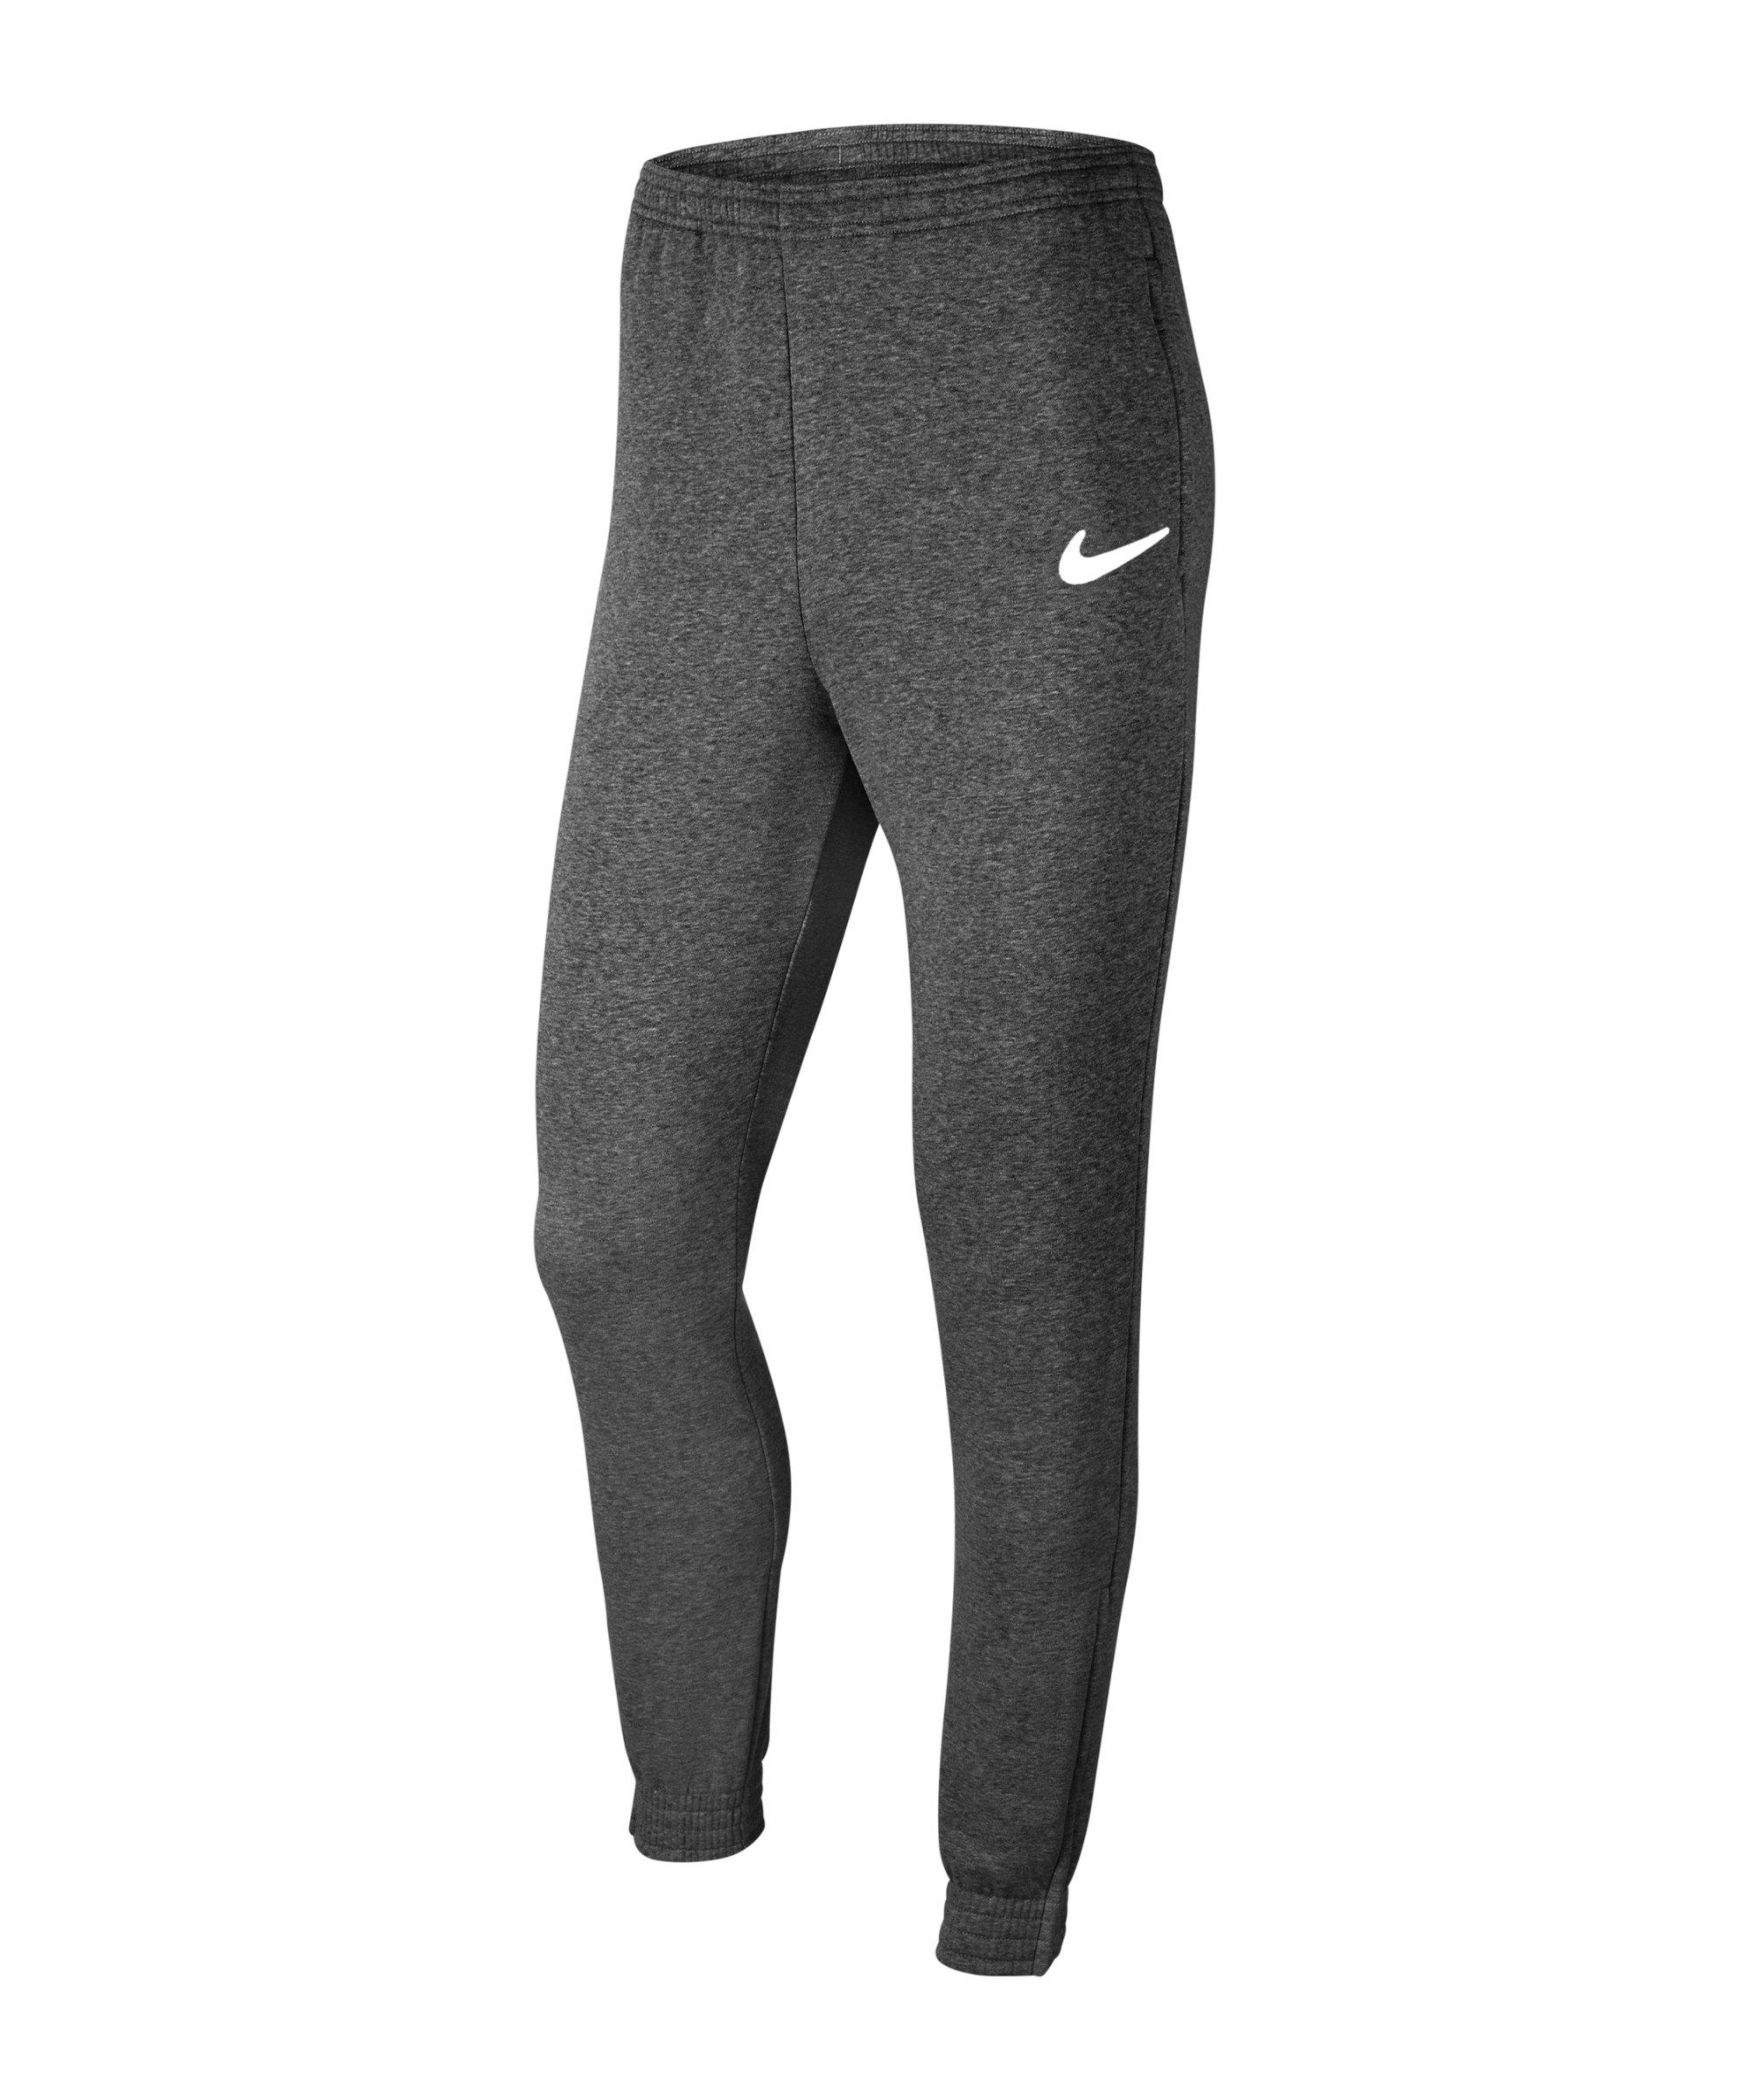 Nike Park 20 Fleece Jogginghose Grau Weiss F071 - grau